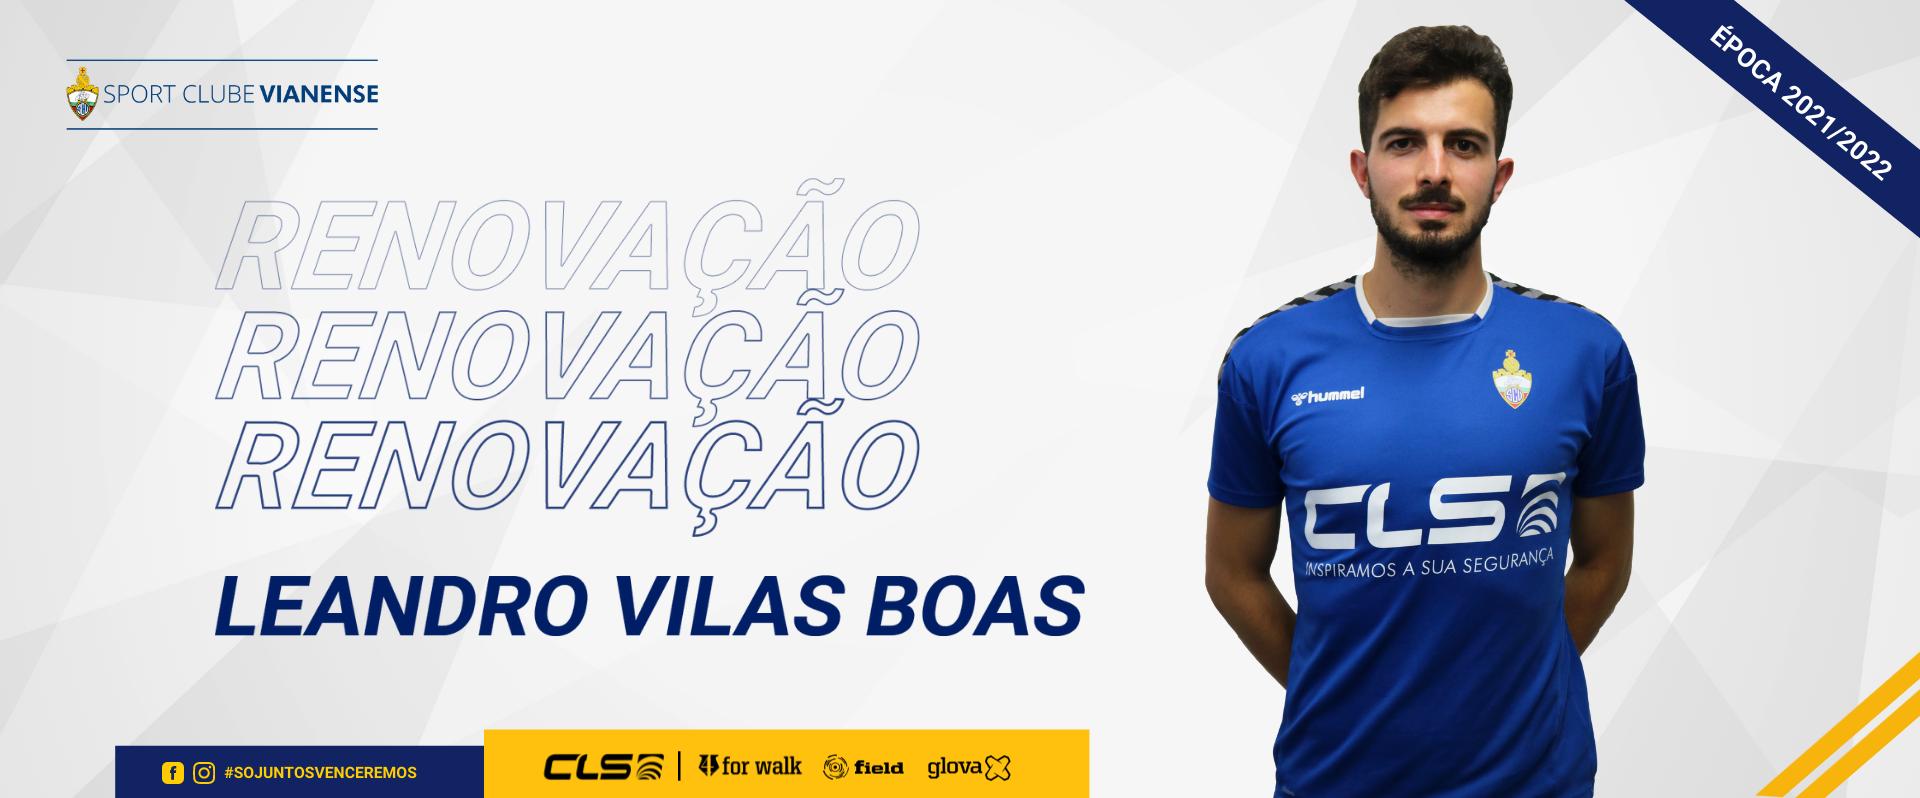 Leandro Vilas Boas renova contrato